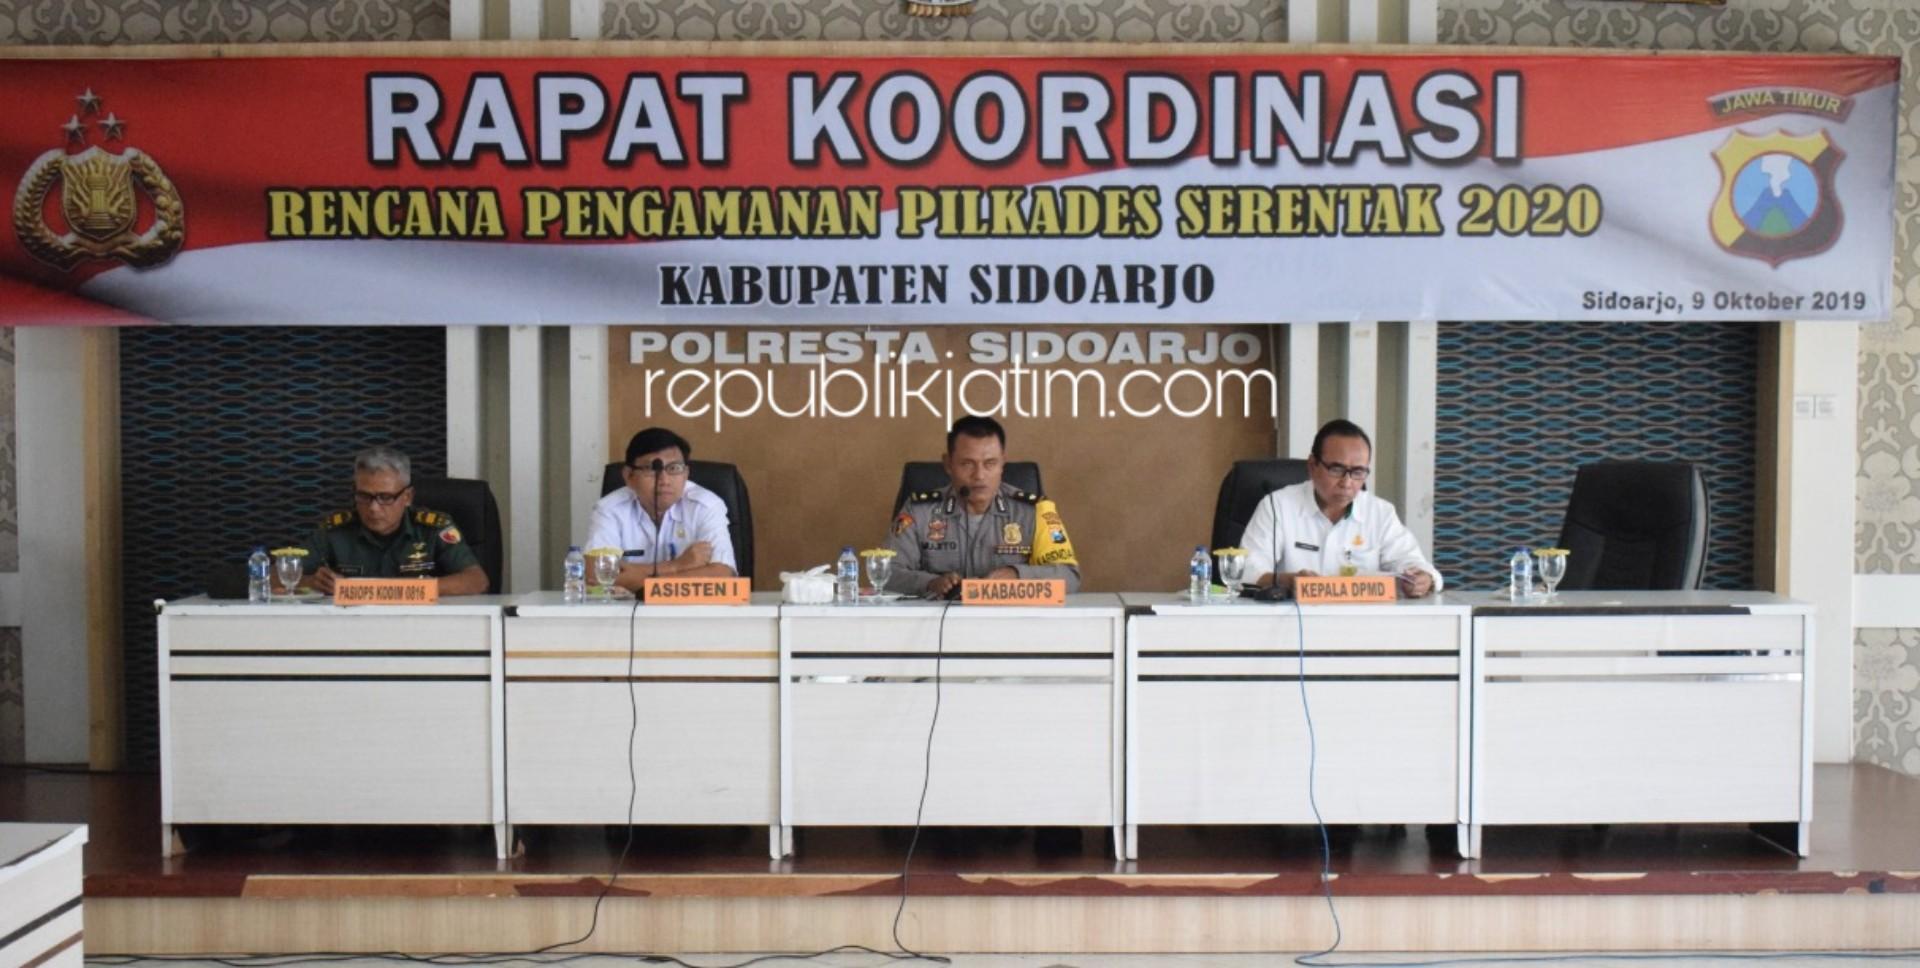 Jelang Pilkades Serentak, Polresta Sidoarjo Gelar Rakor Pengamanan